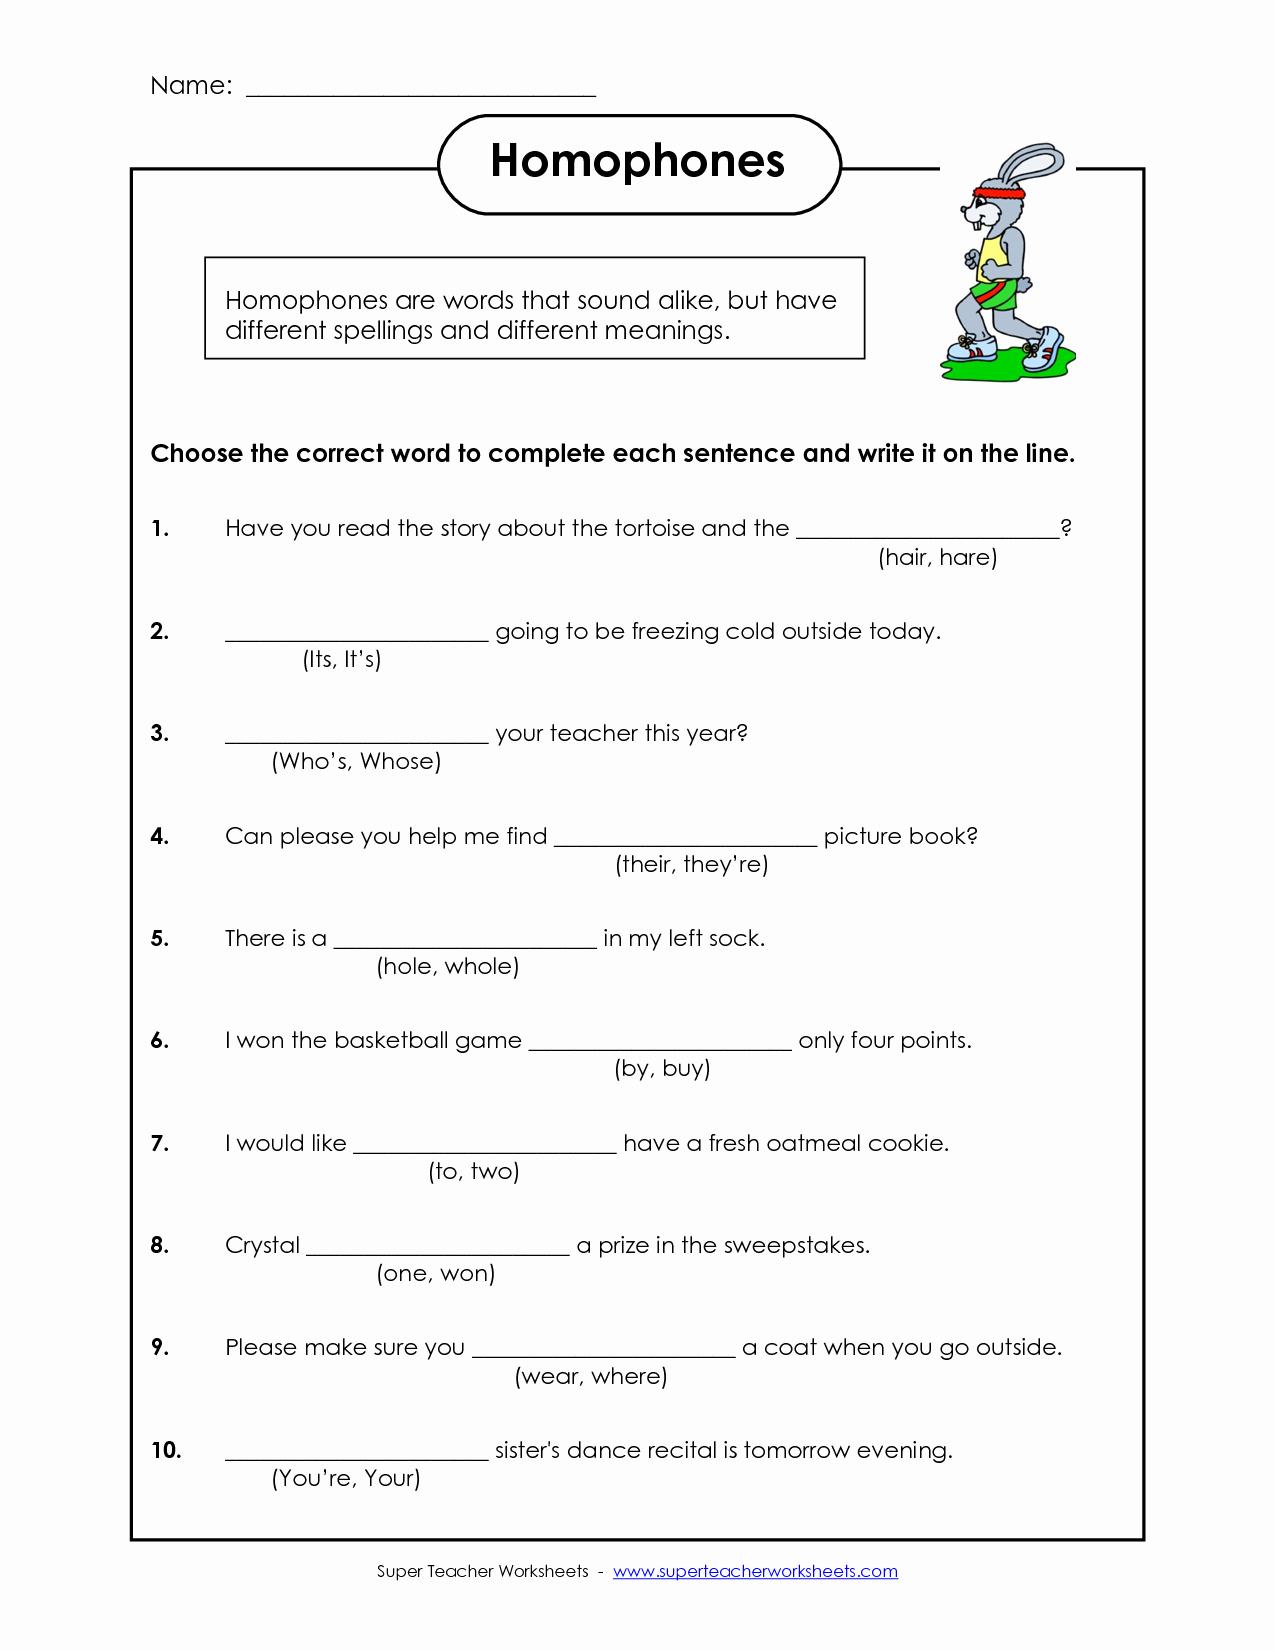 Homographs and Homophones Worksheets Fresh Homophones Worksheet